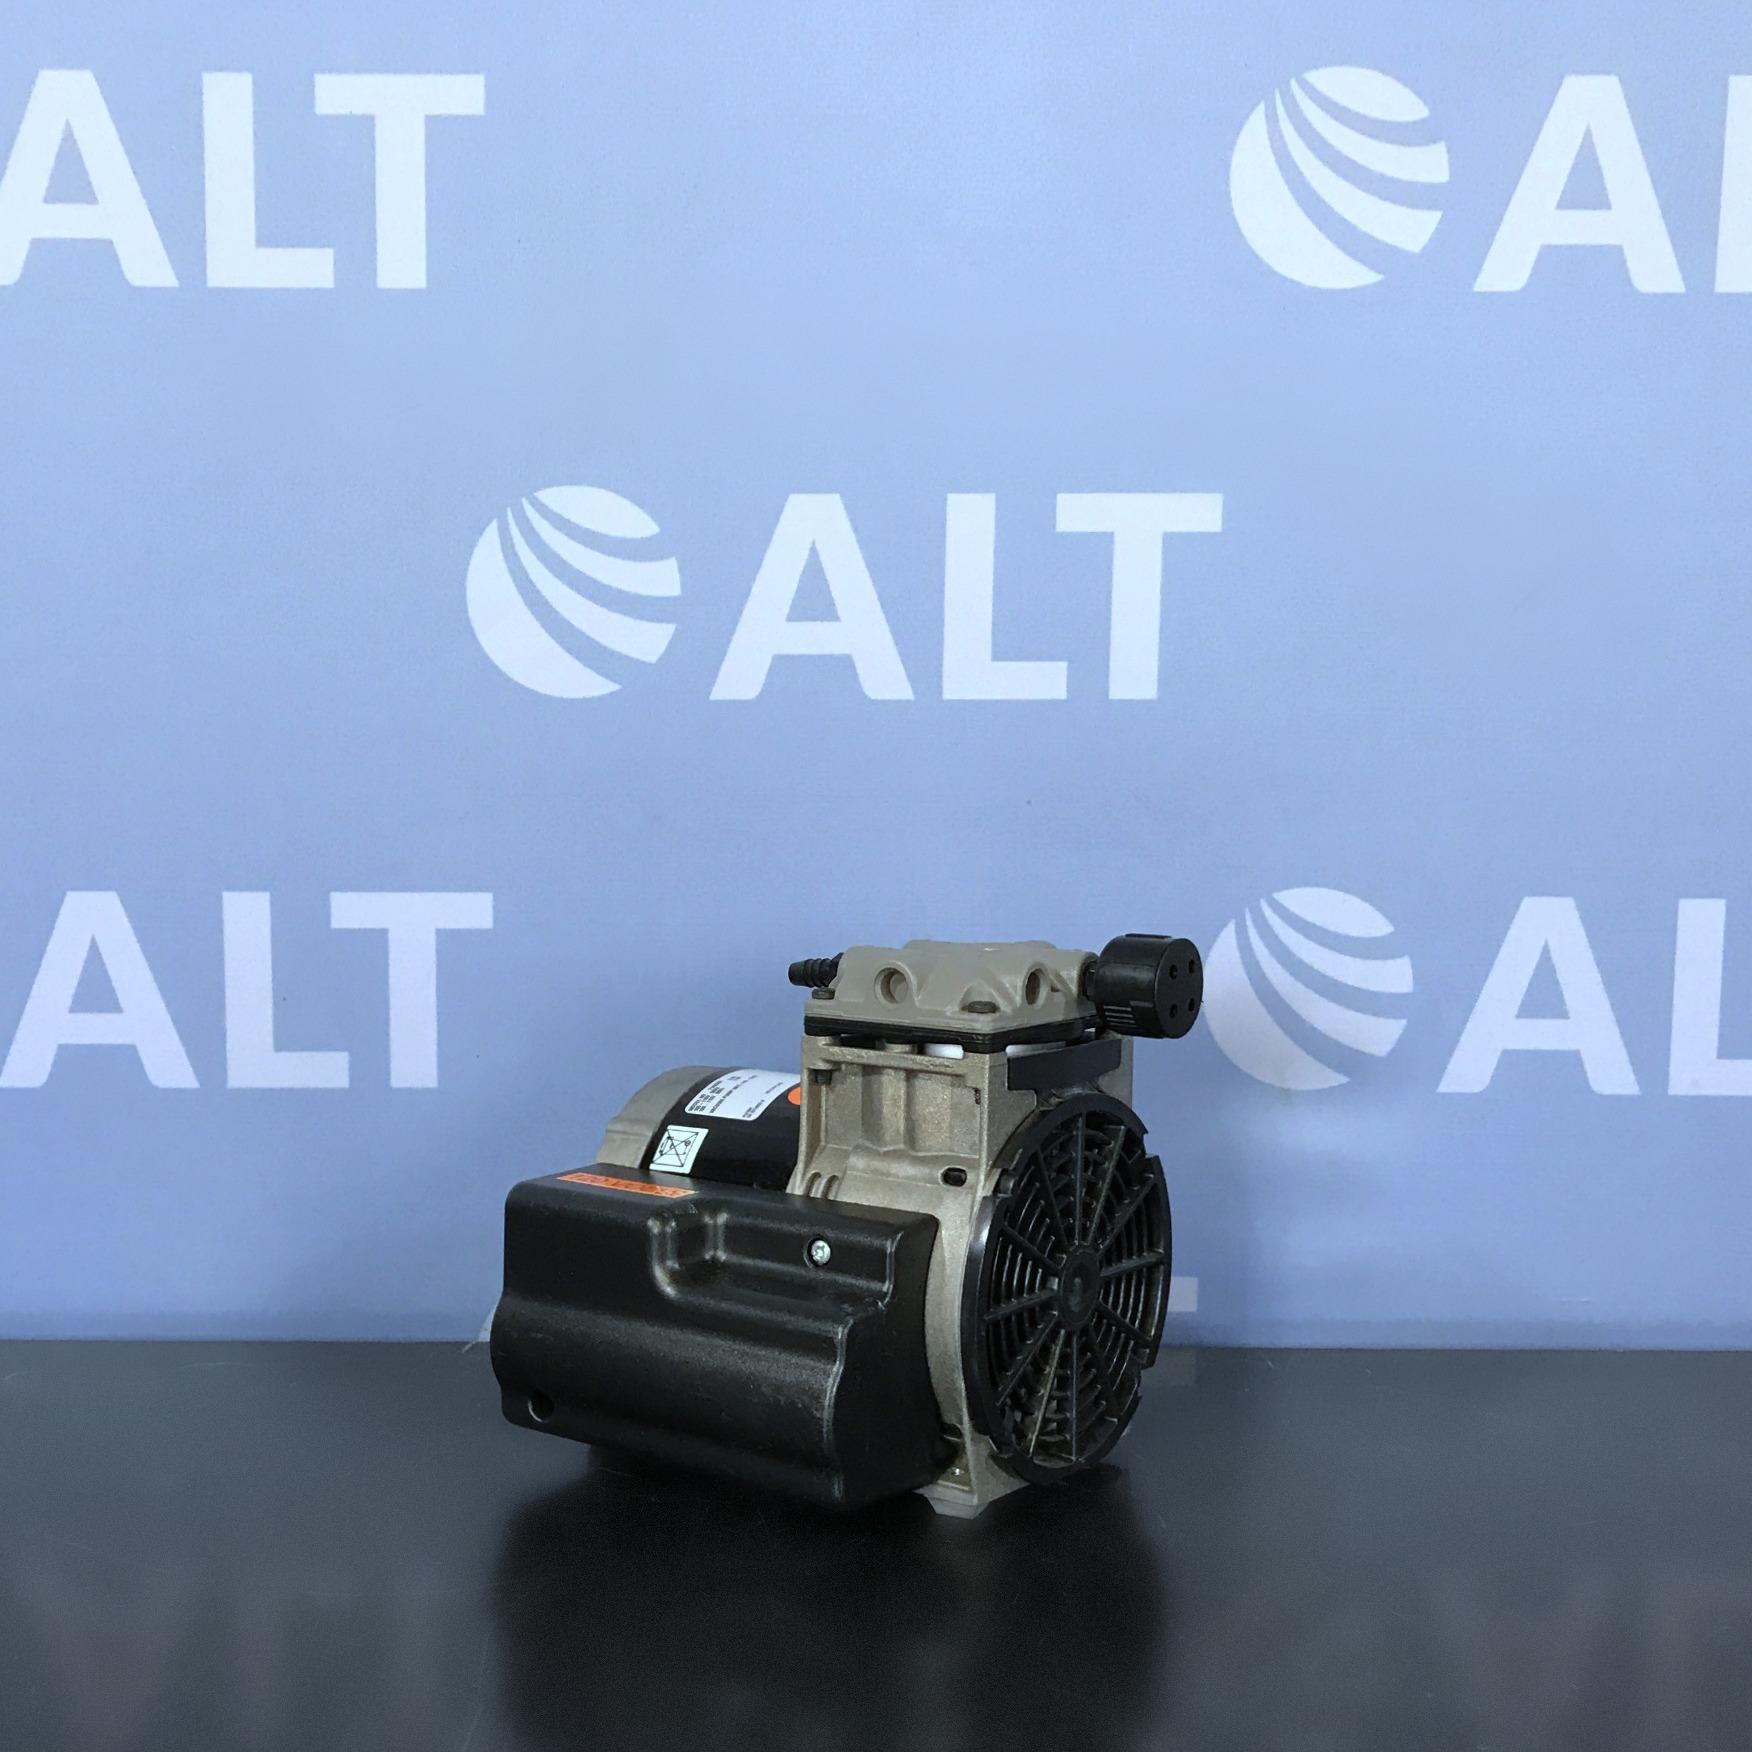 BioTek ELX405 UVS Select Microplate Washer Image